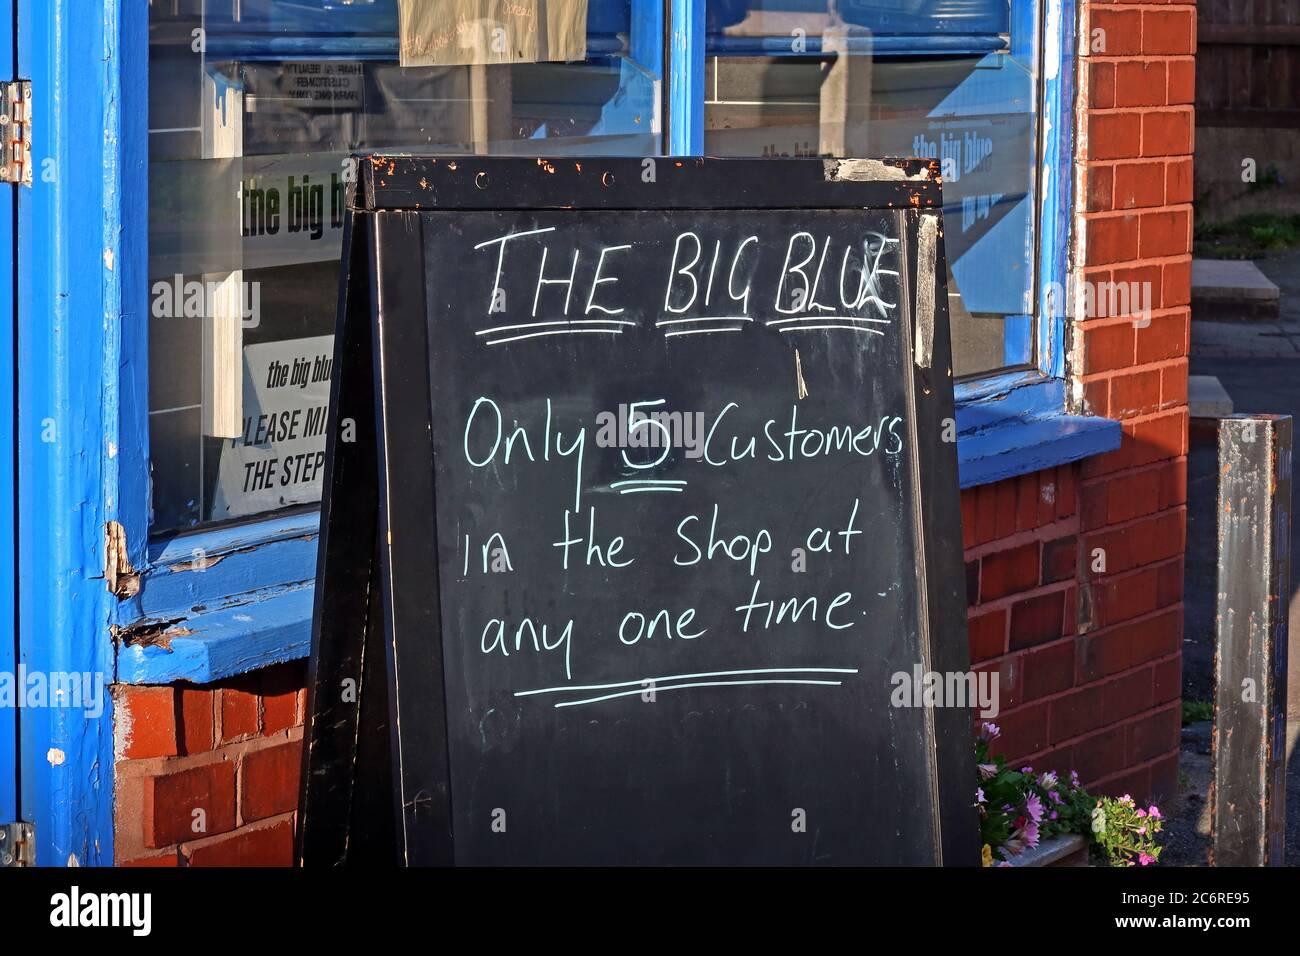 GoTonySmith,HotpixUK,@HotpixUK,England,Cheshire,UK,Warrington,Thelwall,food,Big Blue,Chippy,fish & chips,fish,chips,fried,award winning,awards,shop,retail,Knutsford Rd,WA4,Social Distancing,5 customers,customers,five,Corona Virus,Covid19,outside,two metre,two metres,distancing,safe,safety